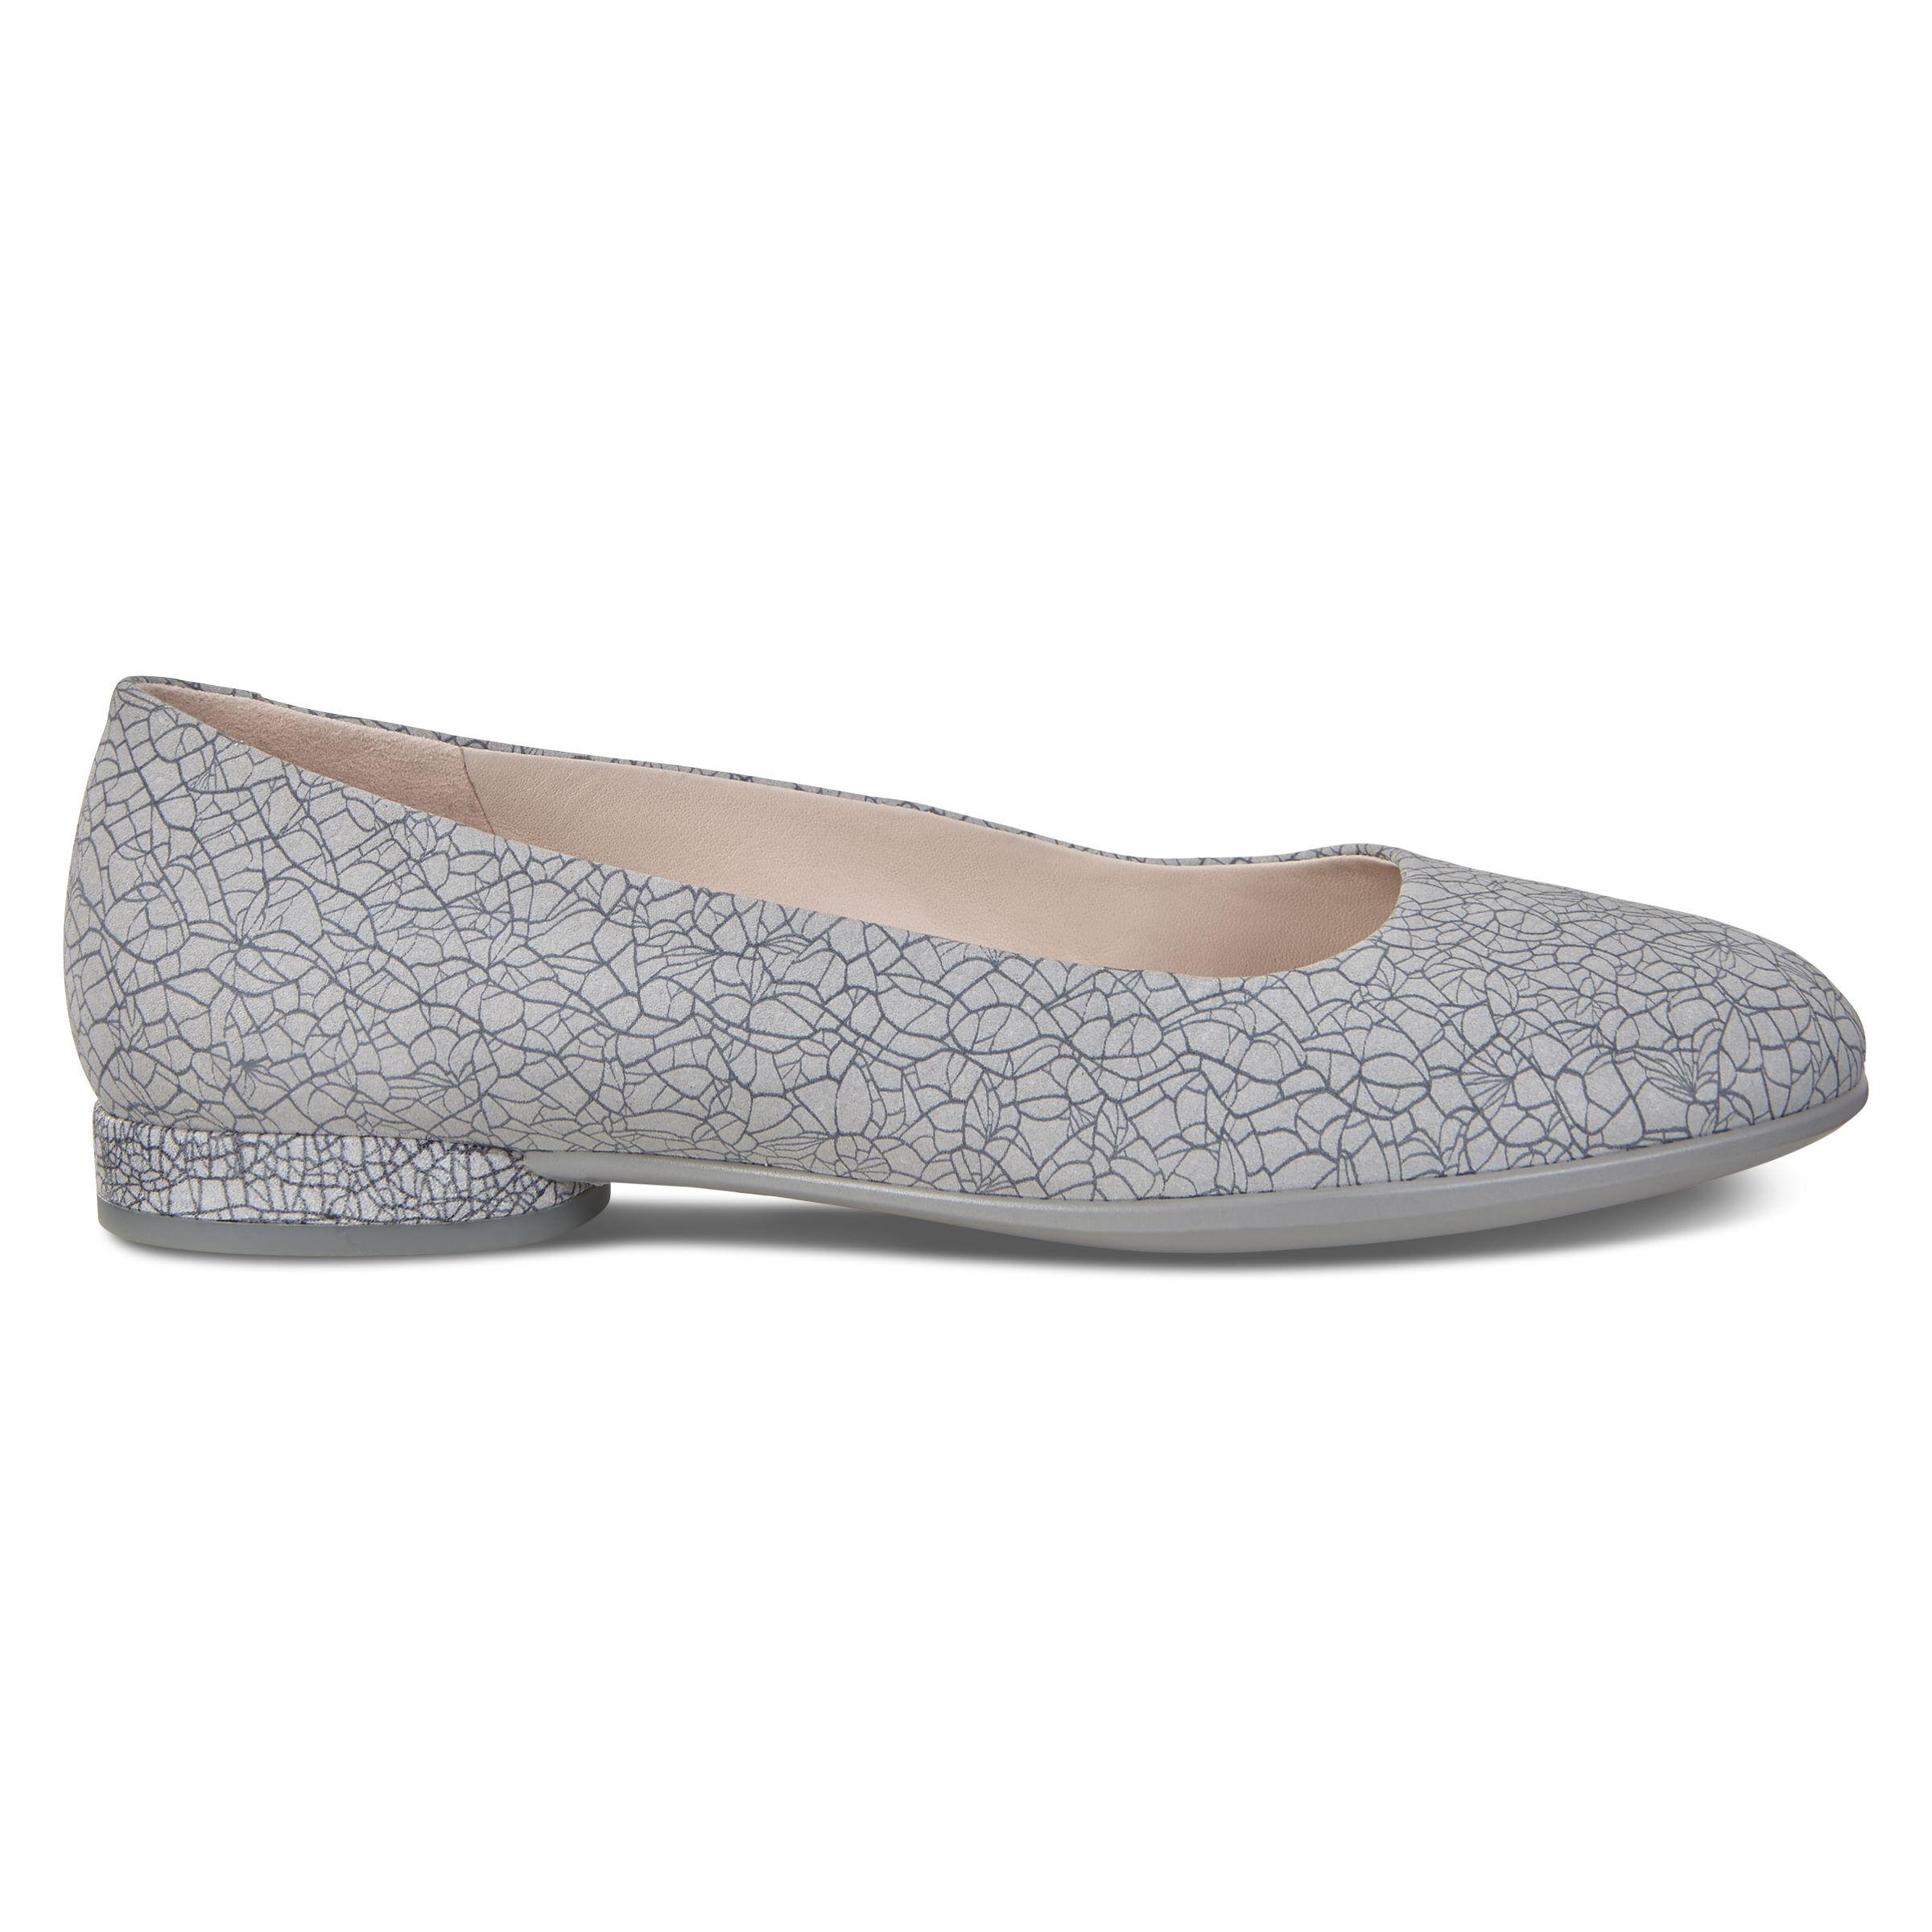 Cjqs54r3al Rosa Monaco Amazon Shoes Classico Menbur BedxoC